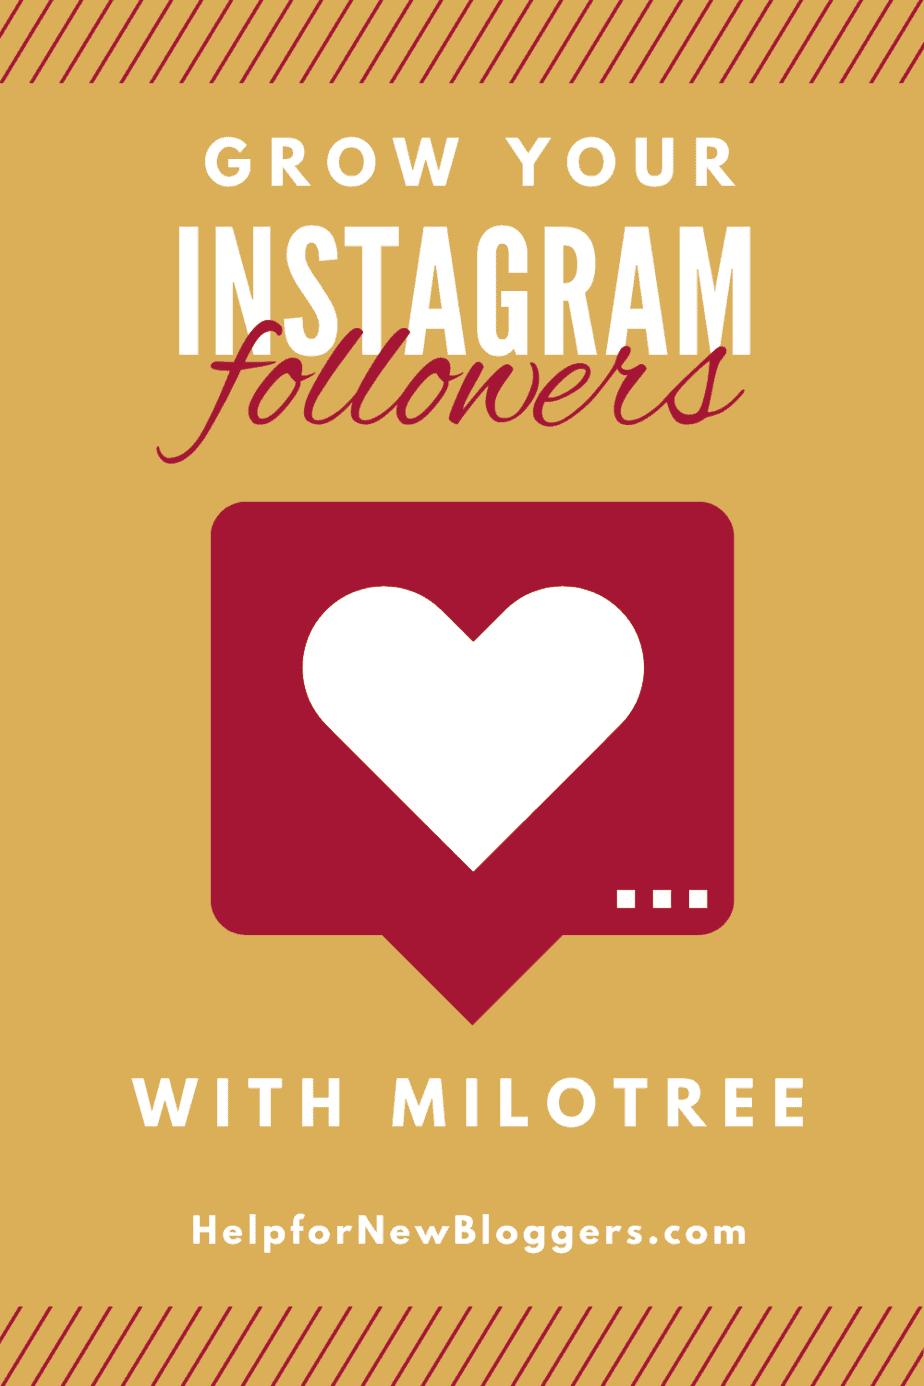 Get Instagram Followers with Milotree